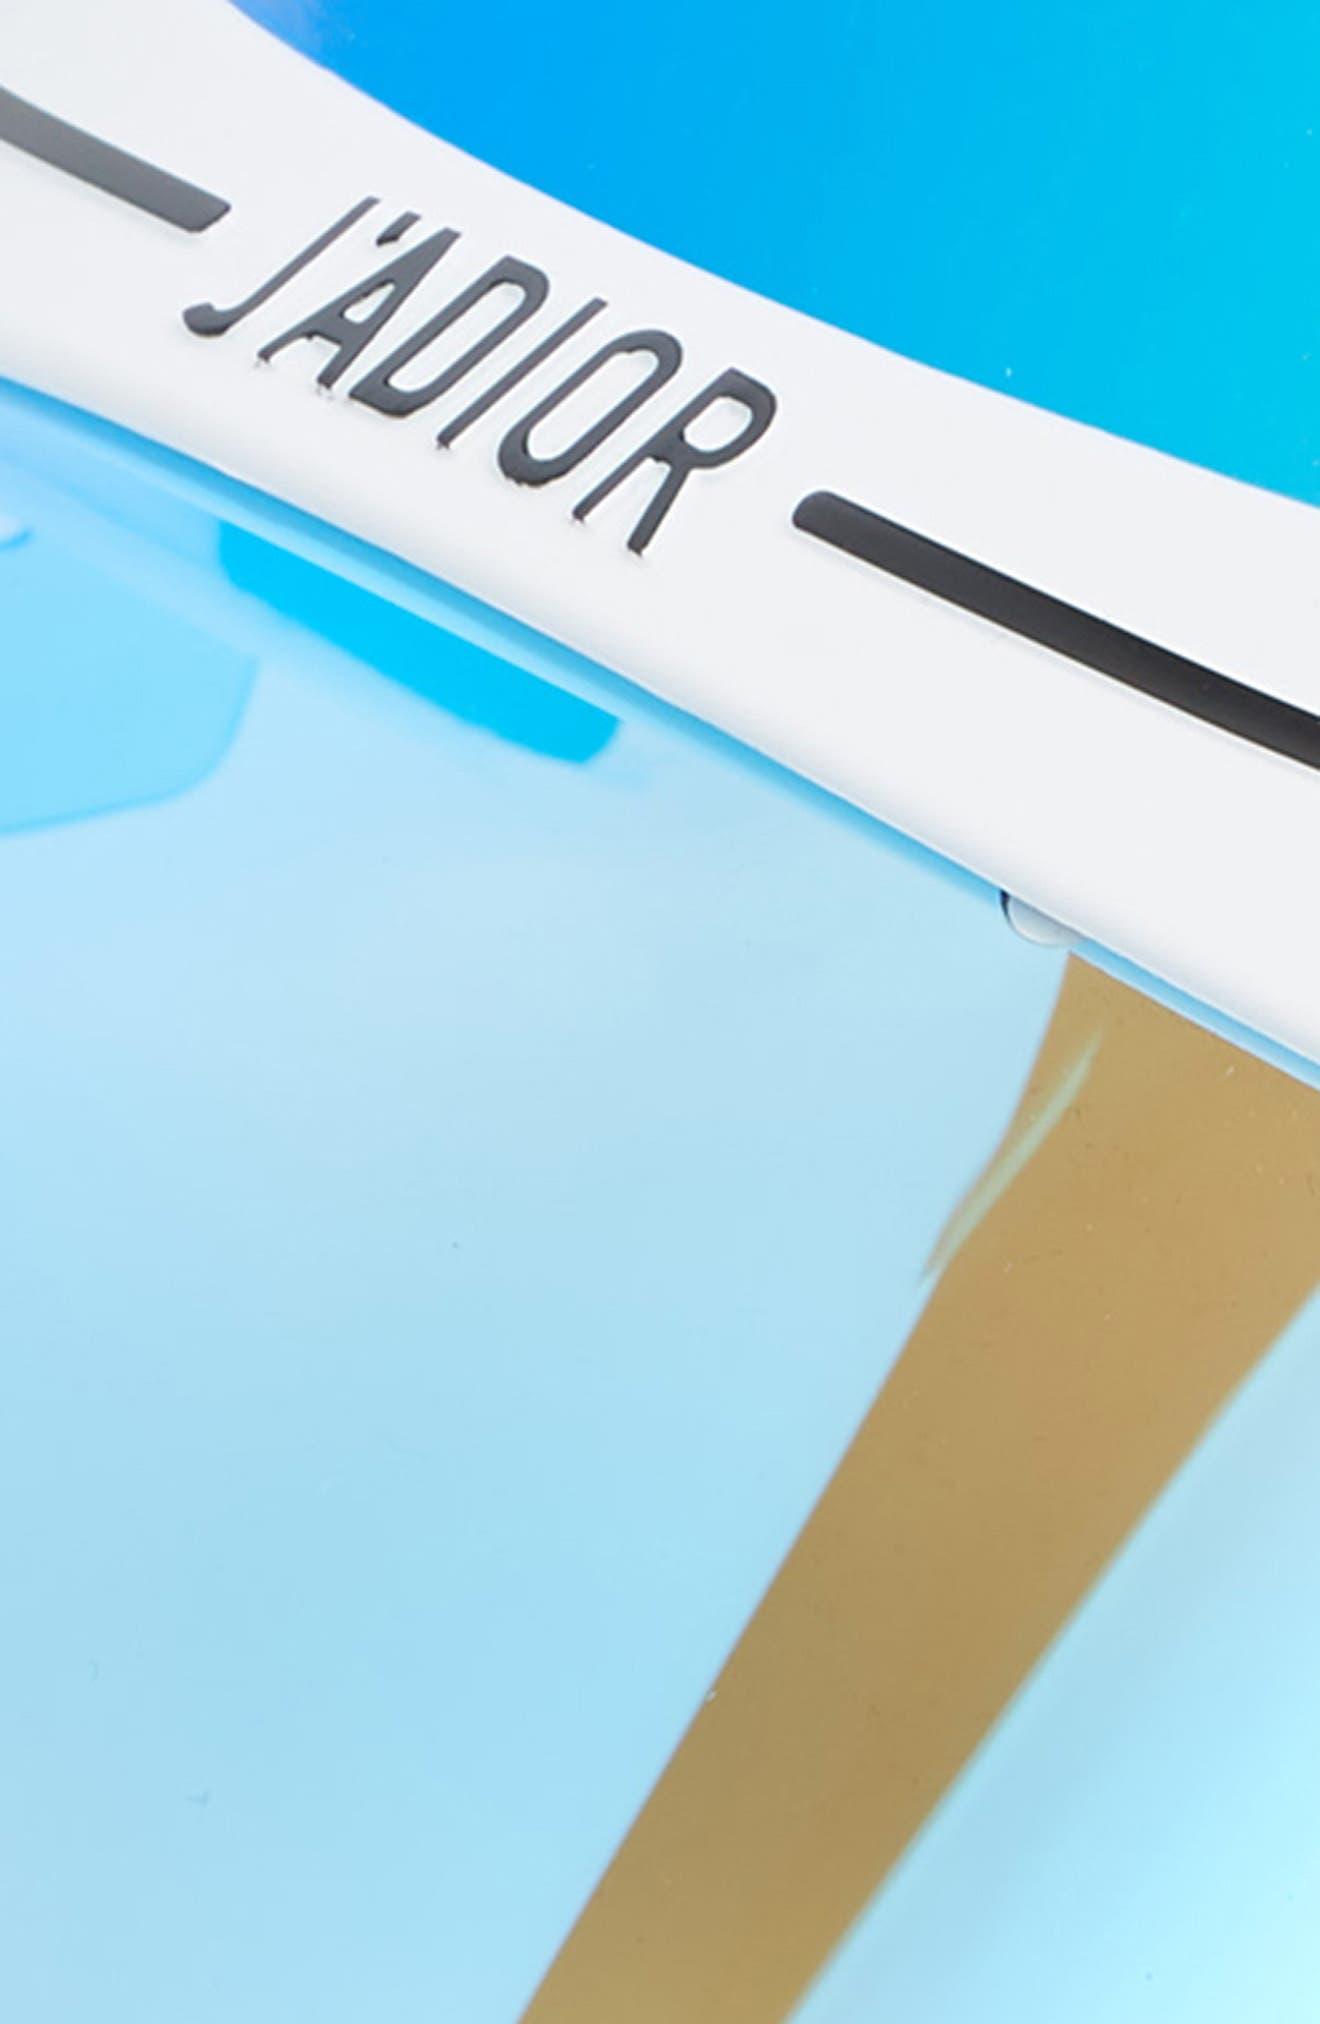 DiorClub1 Visor,                             Alternate thumbnail 3, color,                             METALLIC BLUE/ GUNMETAL